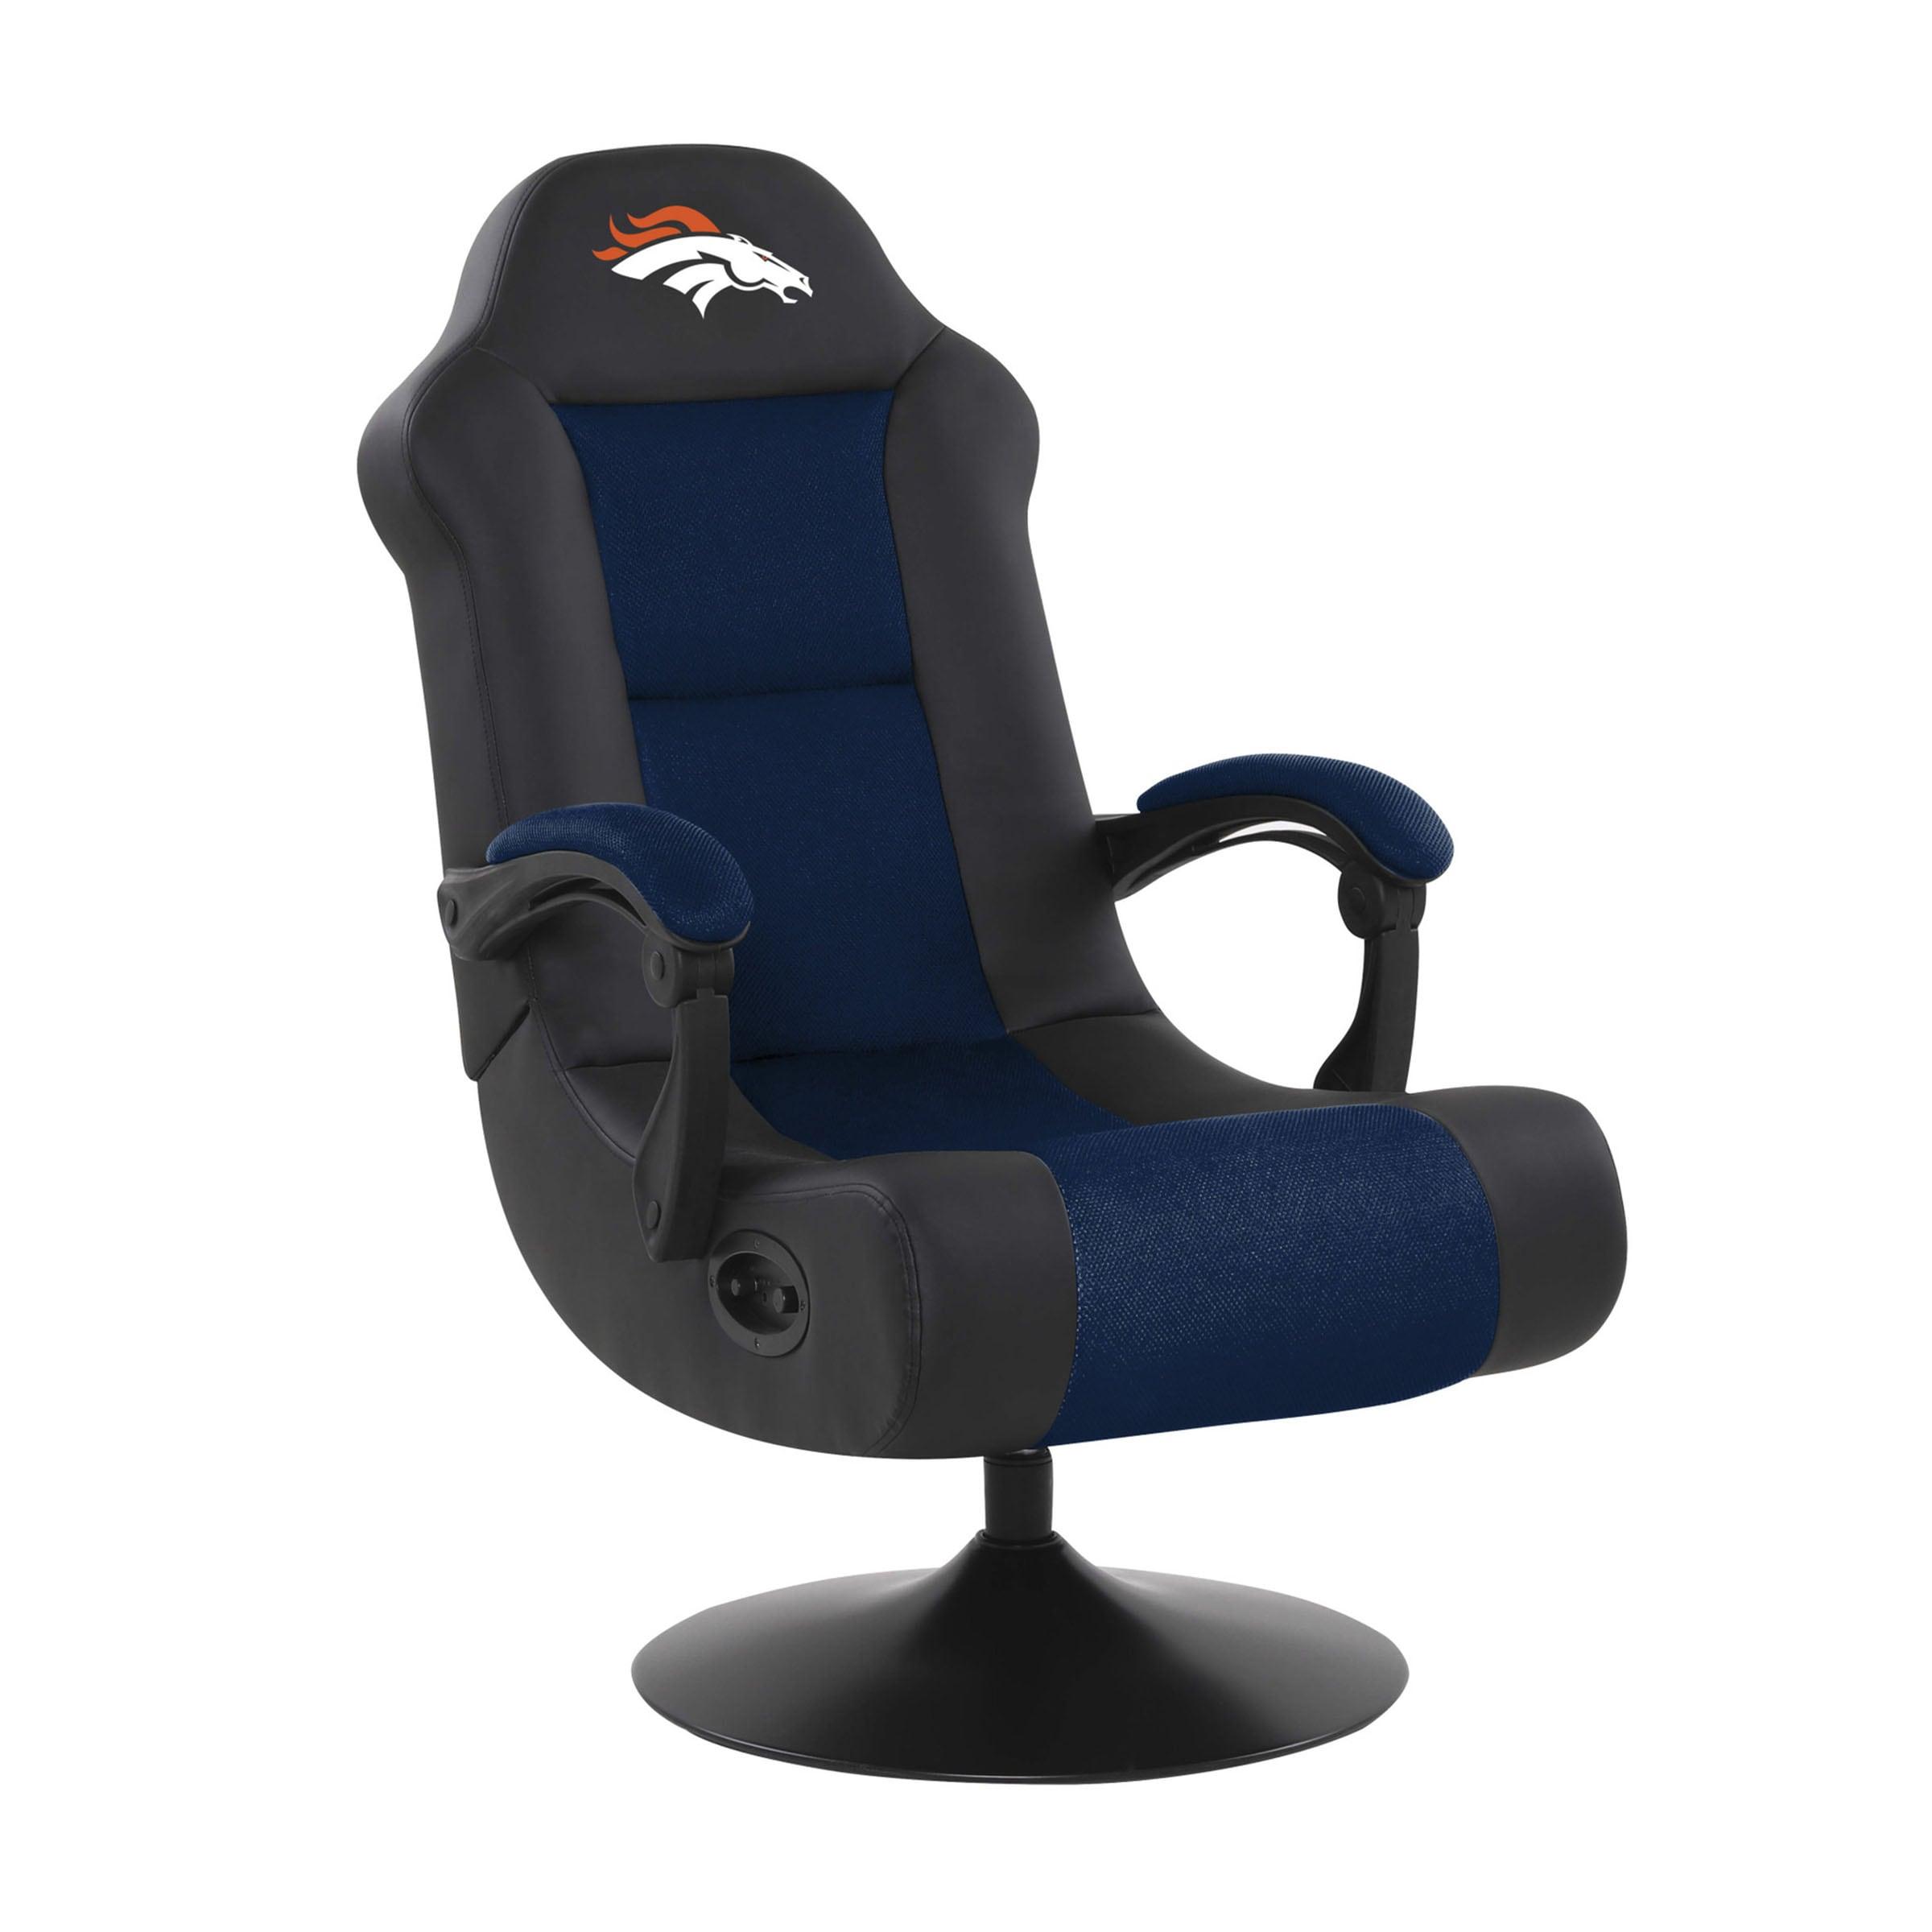 Denver Broncos Imperial Ultra Game Chair - Black